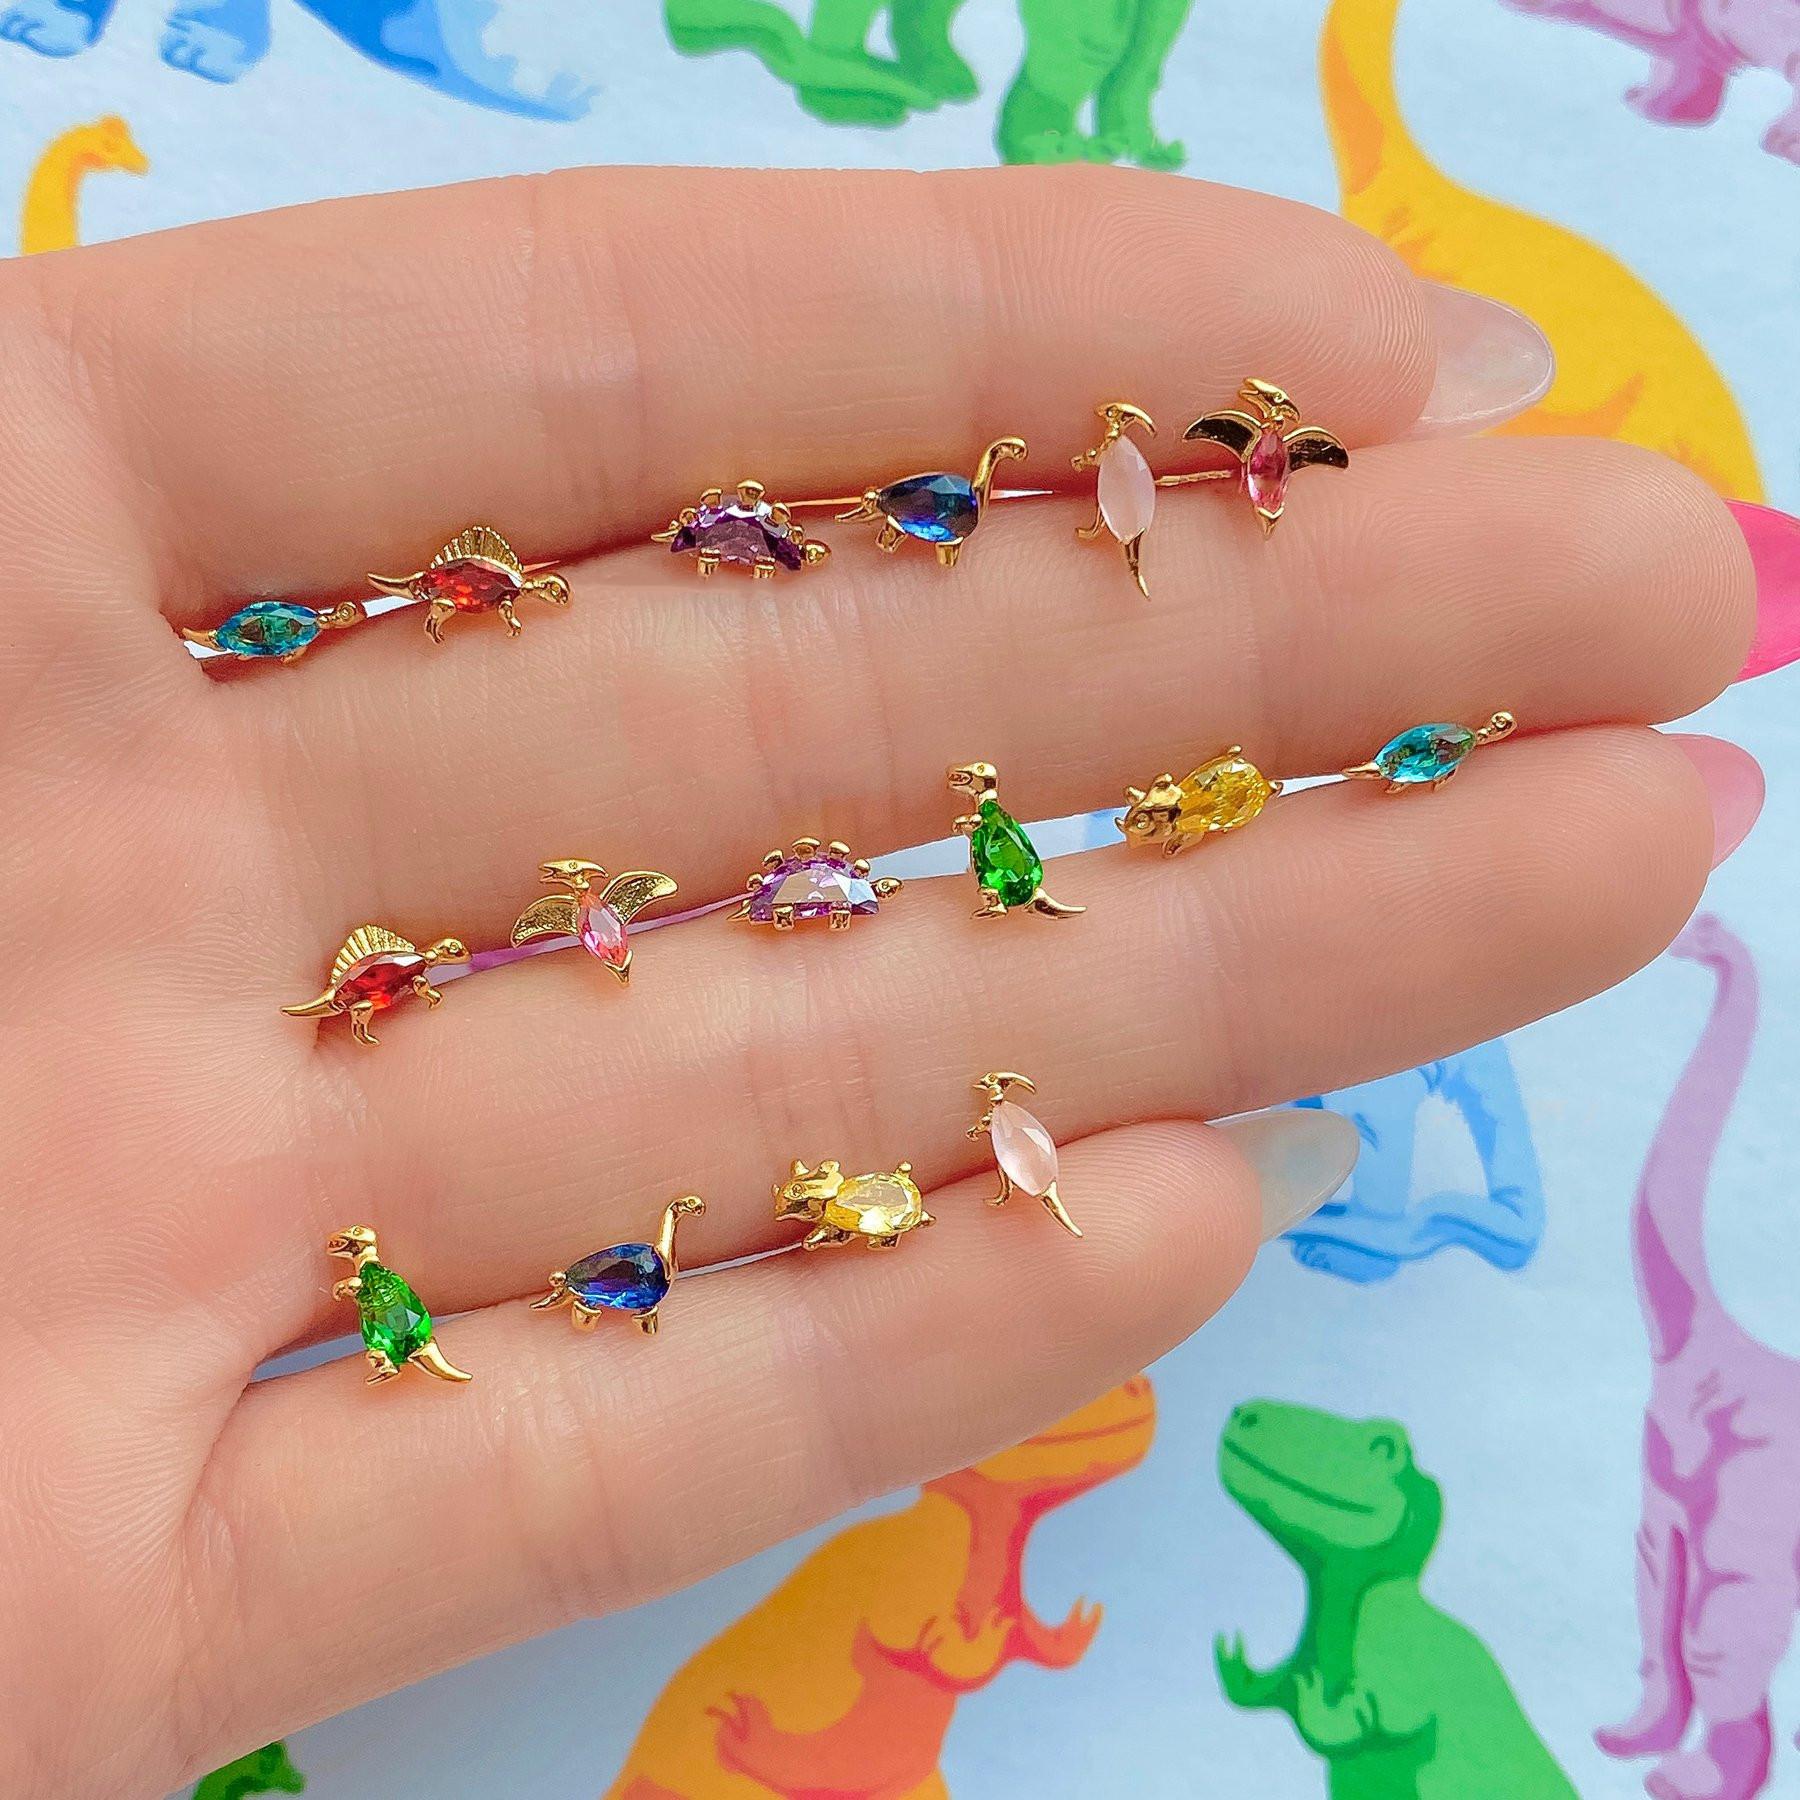 Small dinosaur series stud earrings wholesale18K gold colorpreserving jewelry tropical rainforest animal earrings  NHUW379092